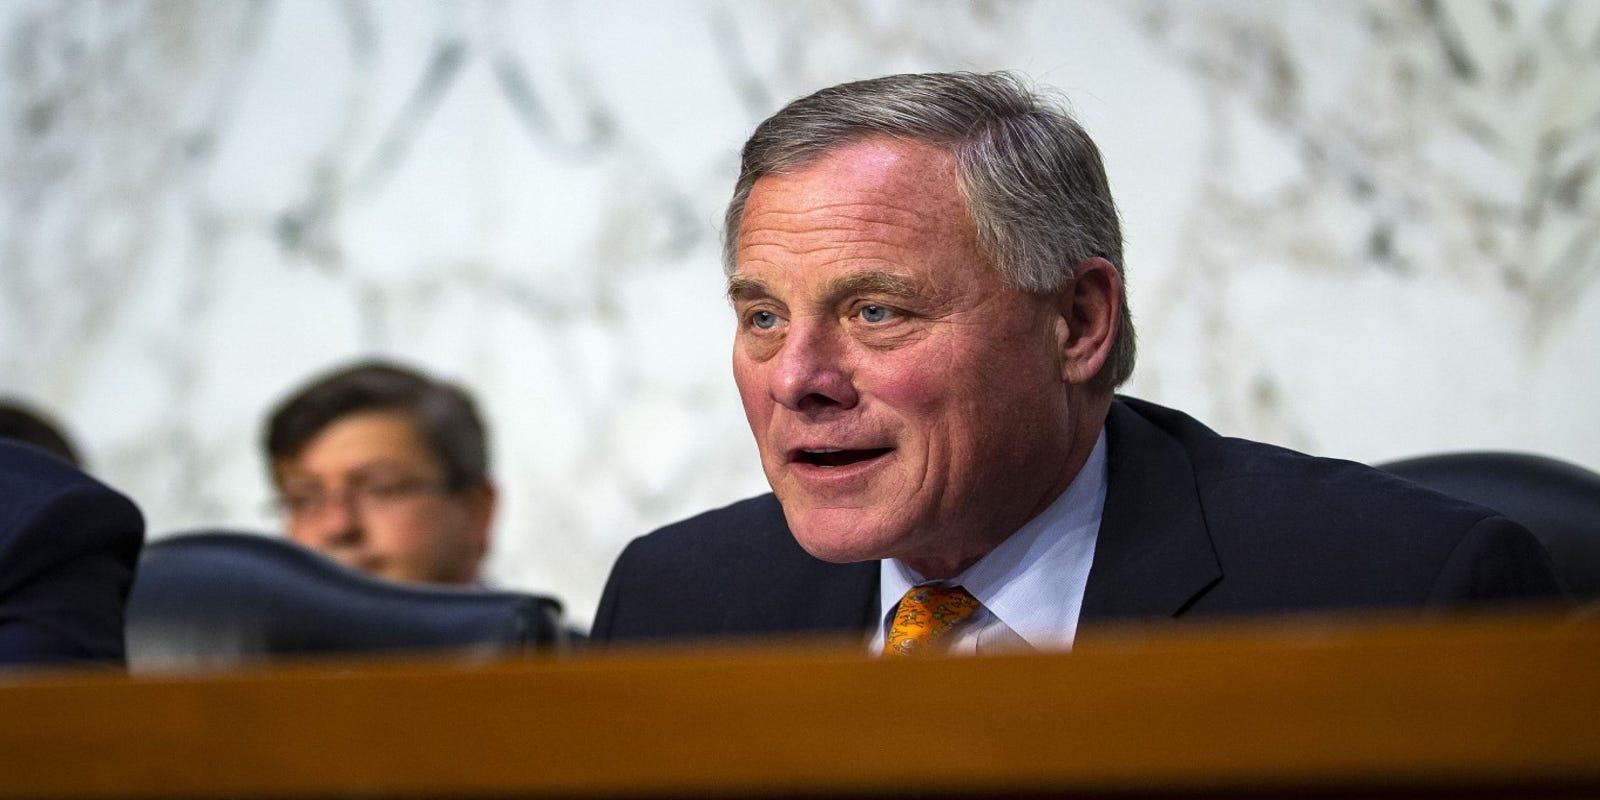 GOP senators sold off their stocks ahead of coronavirus economic crash, reports say